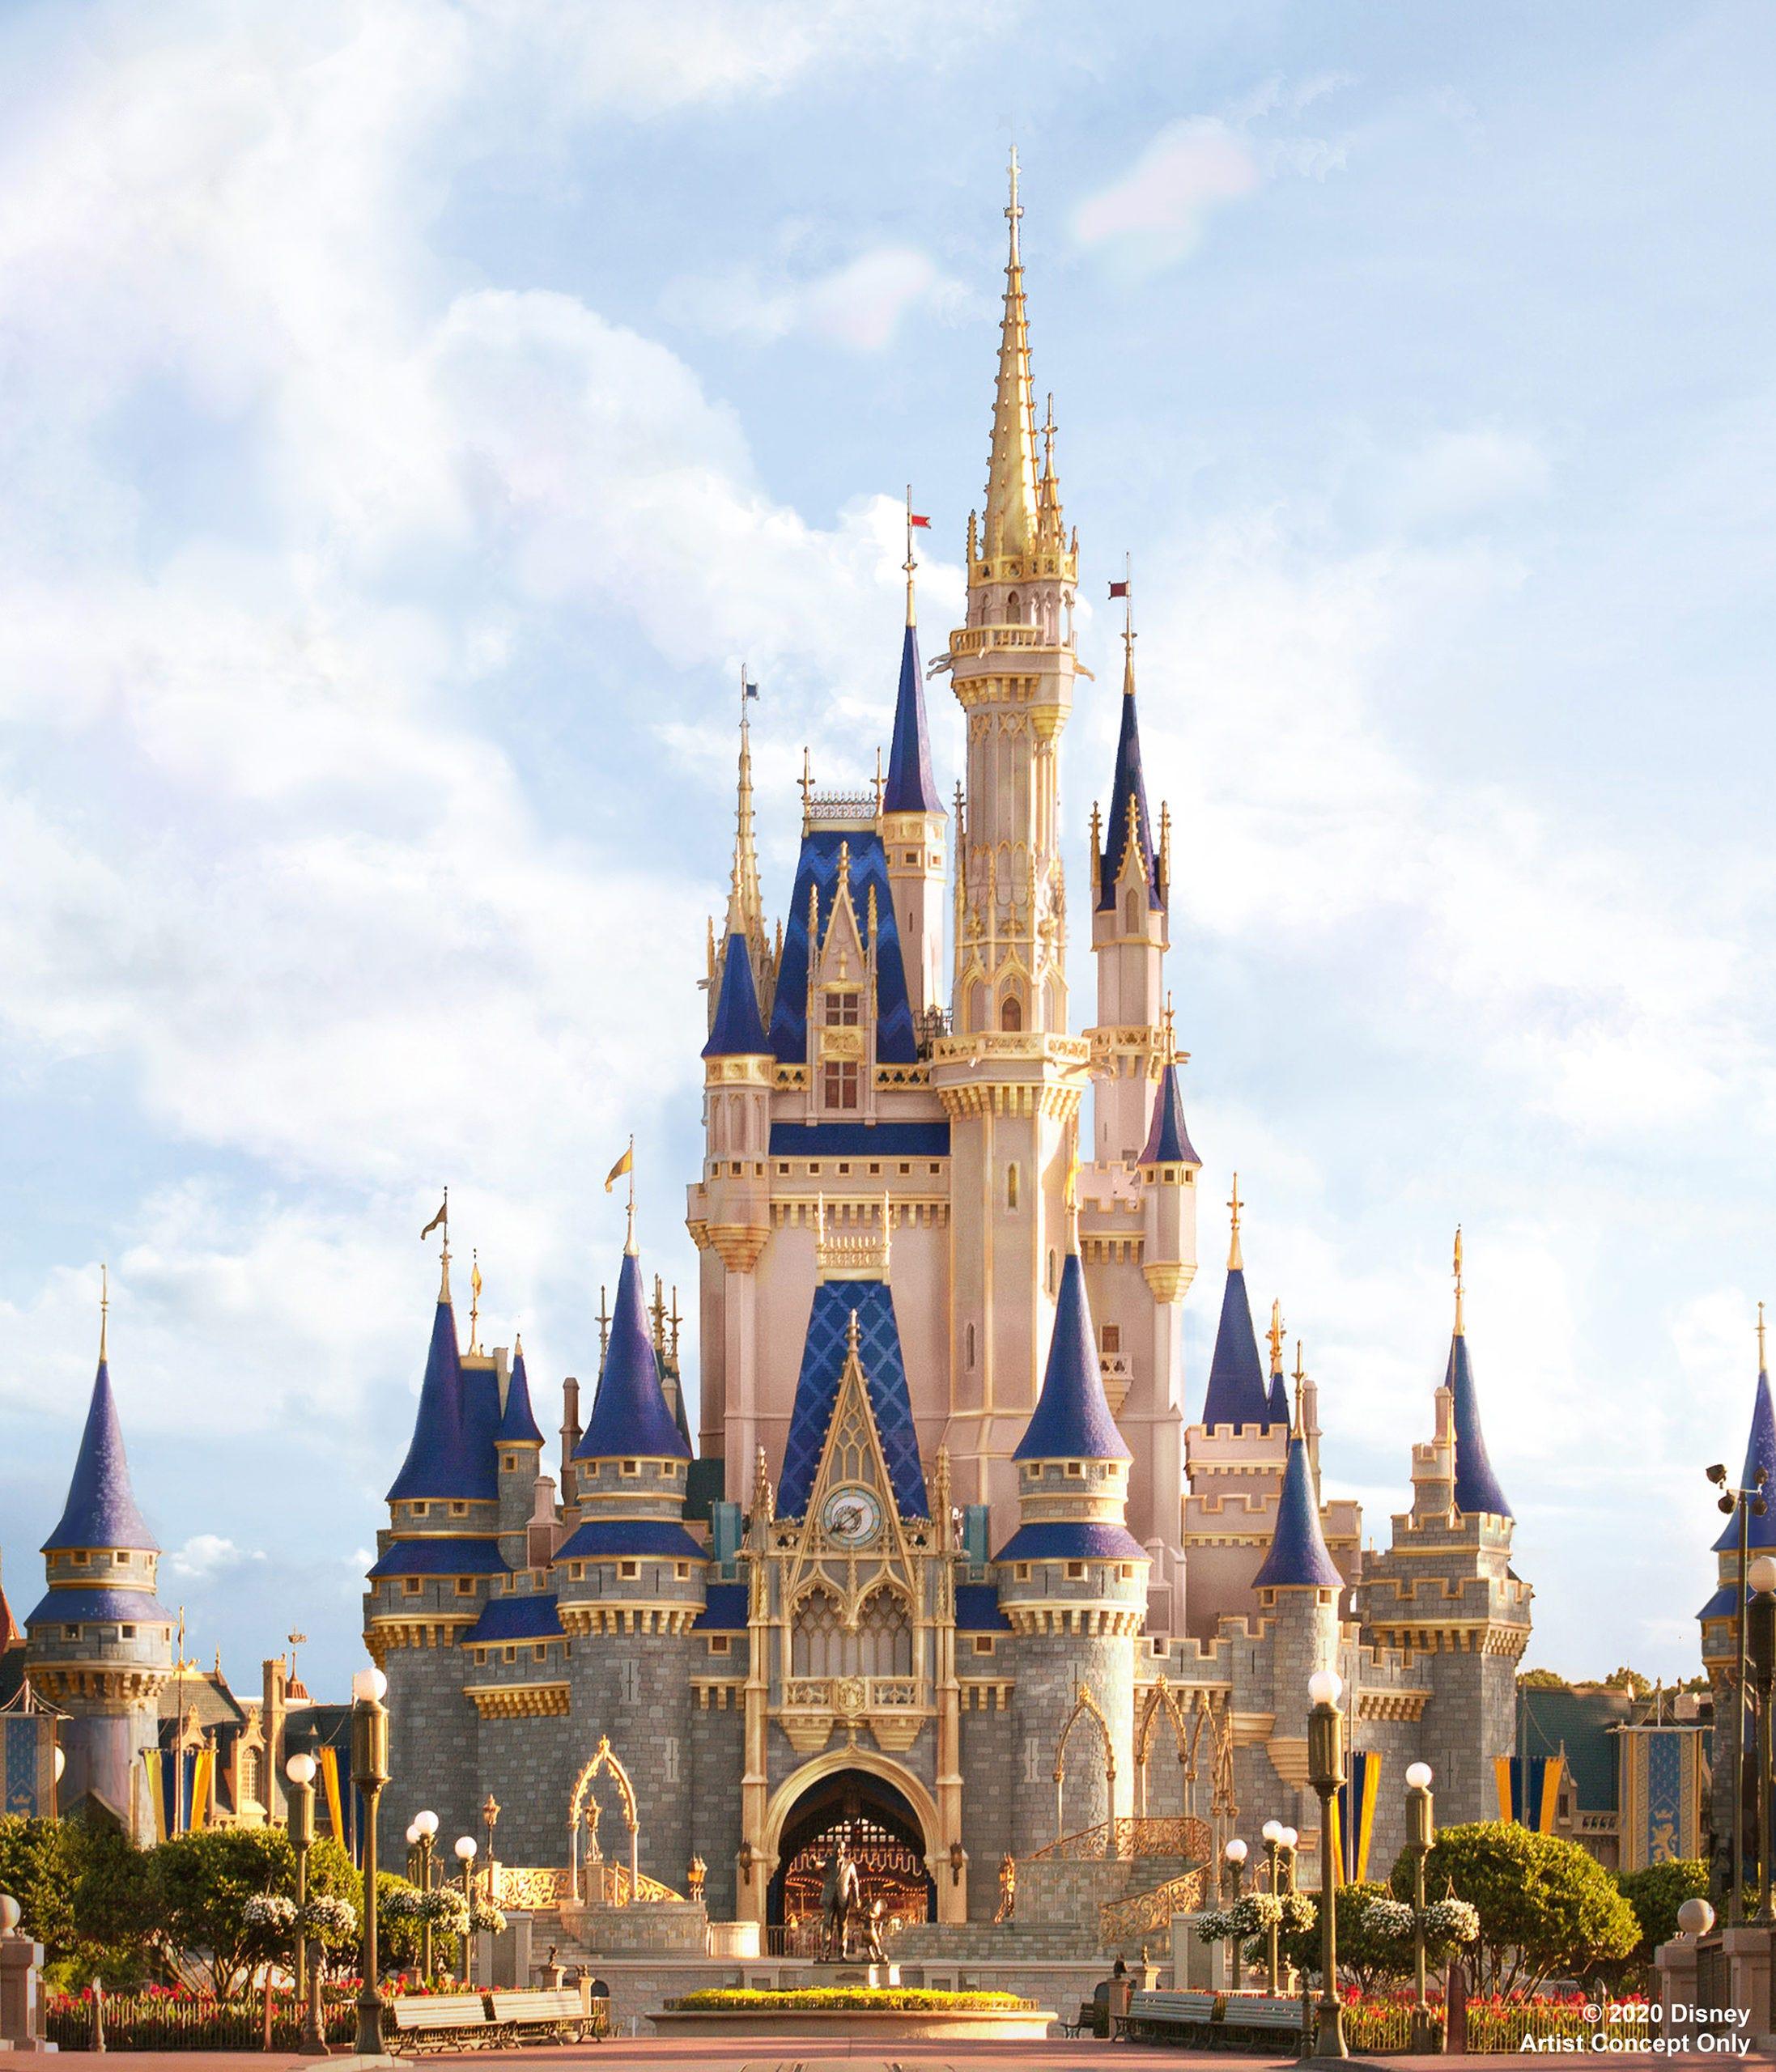 Cinderella Castle at Disney World will get a makeover in honor of  Cinderella  movie